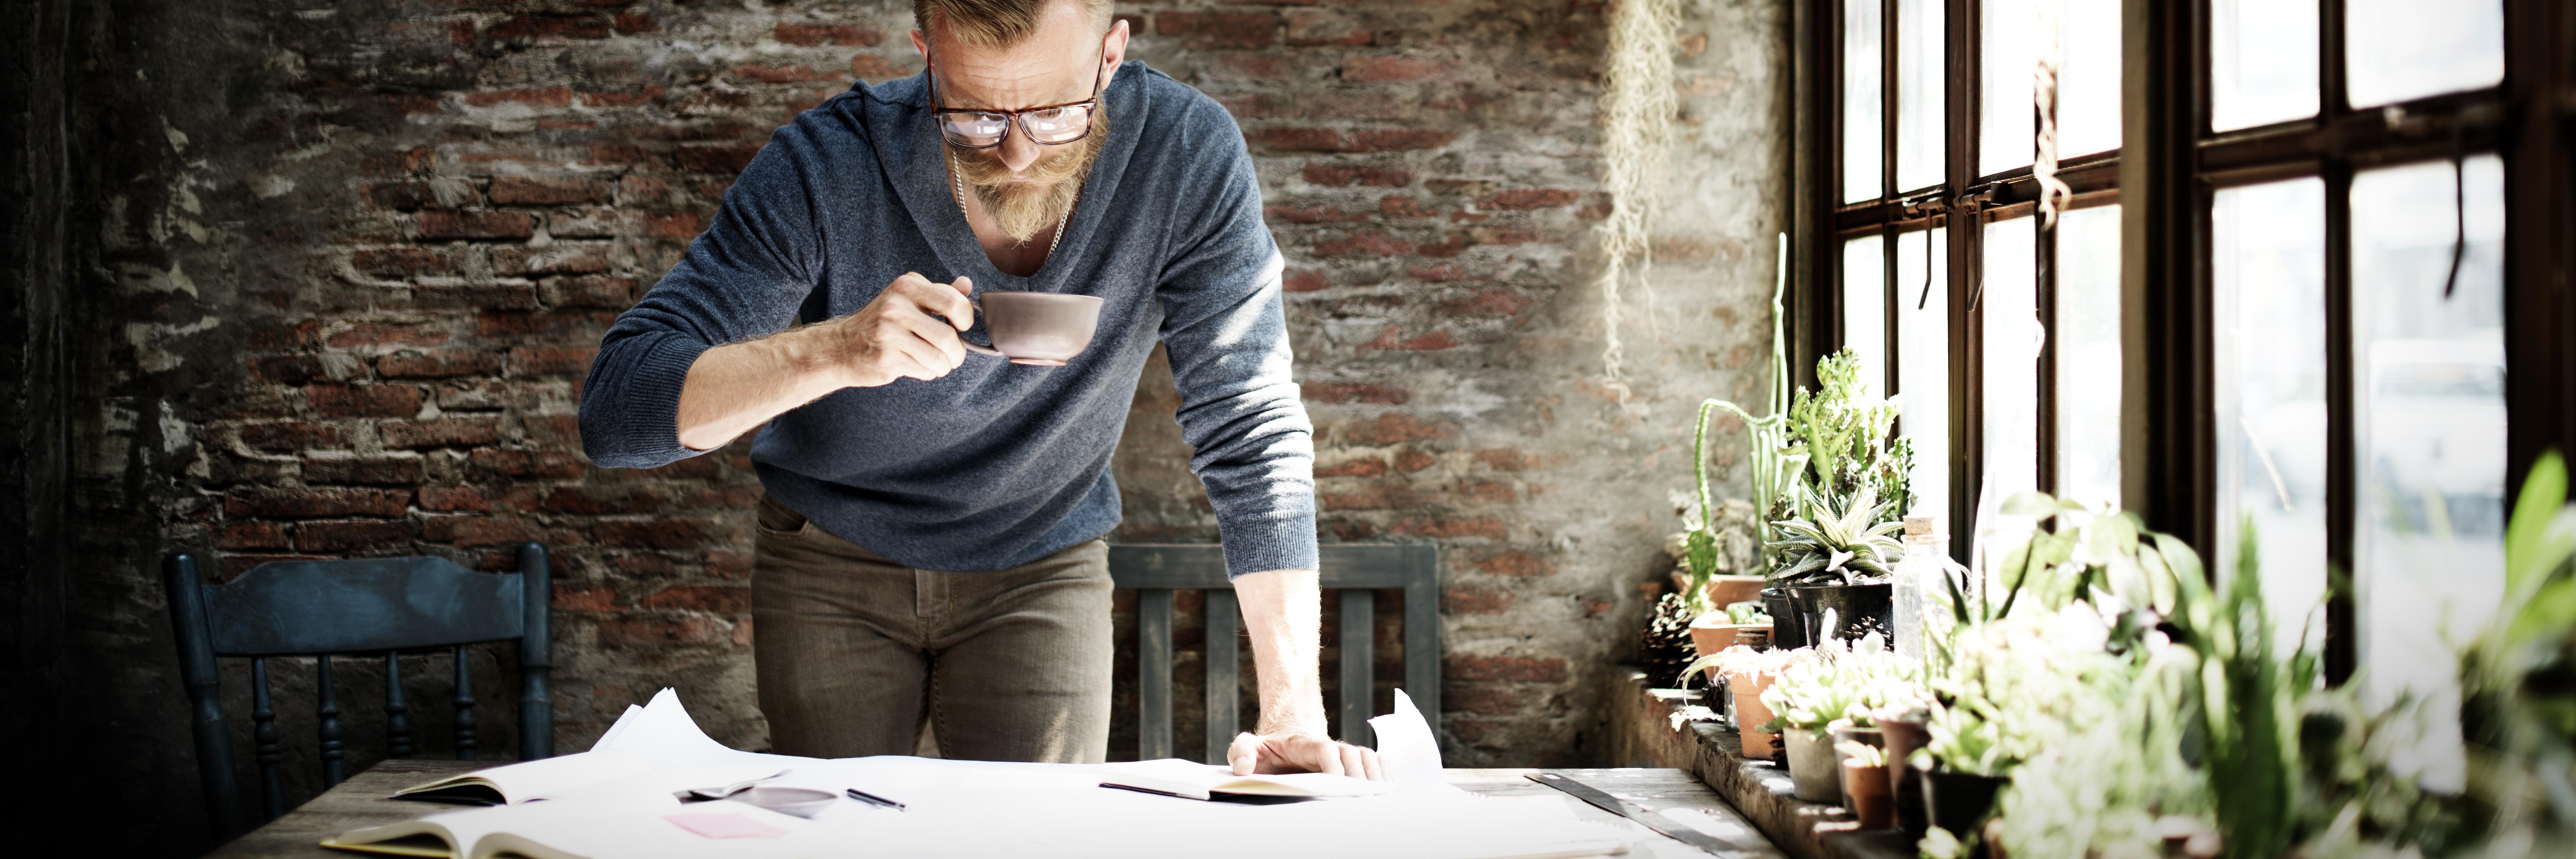 how-to-achieve-work-life-balance